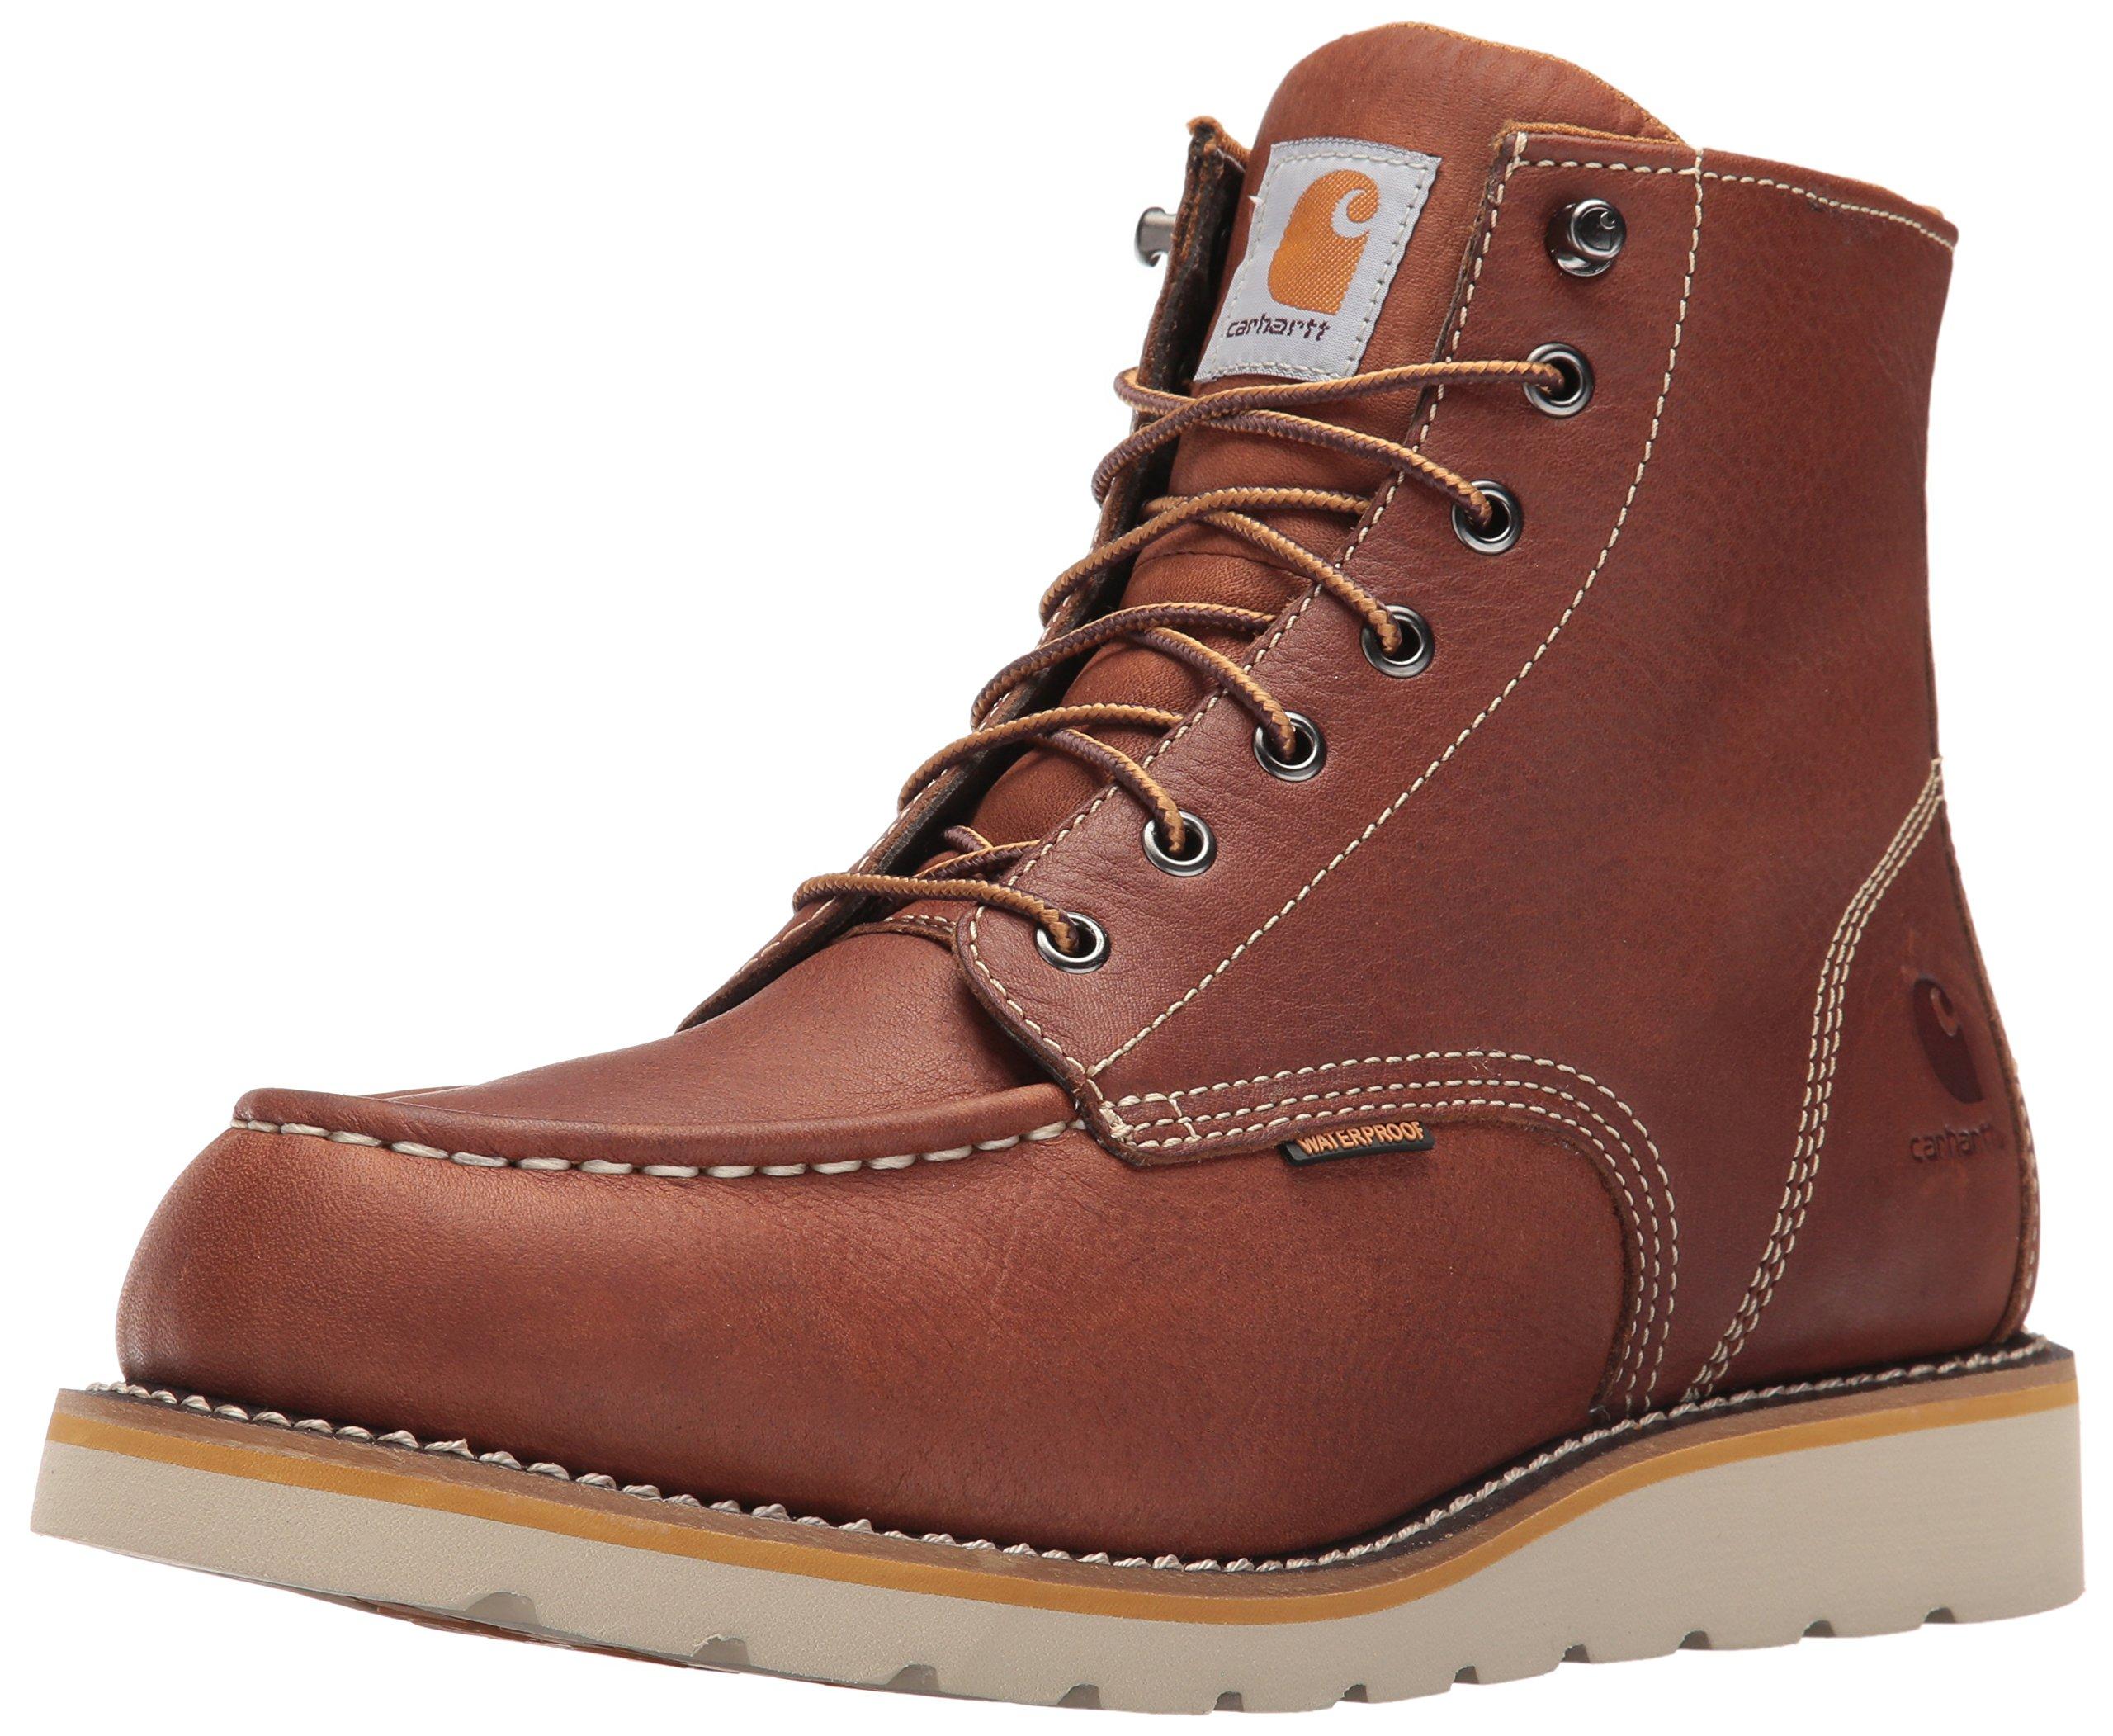 Carhartt Men's 6-Inch Waterproof Wedge Soft Toe Work Boot